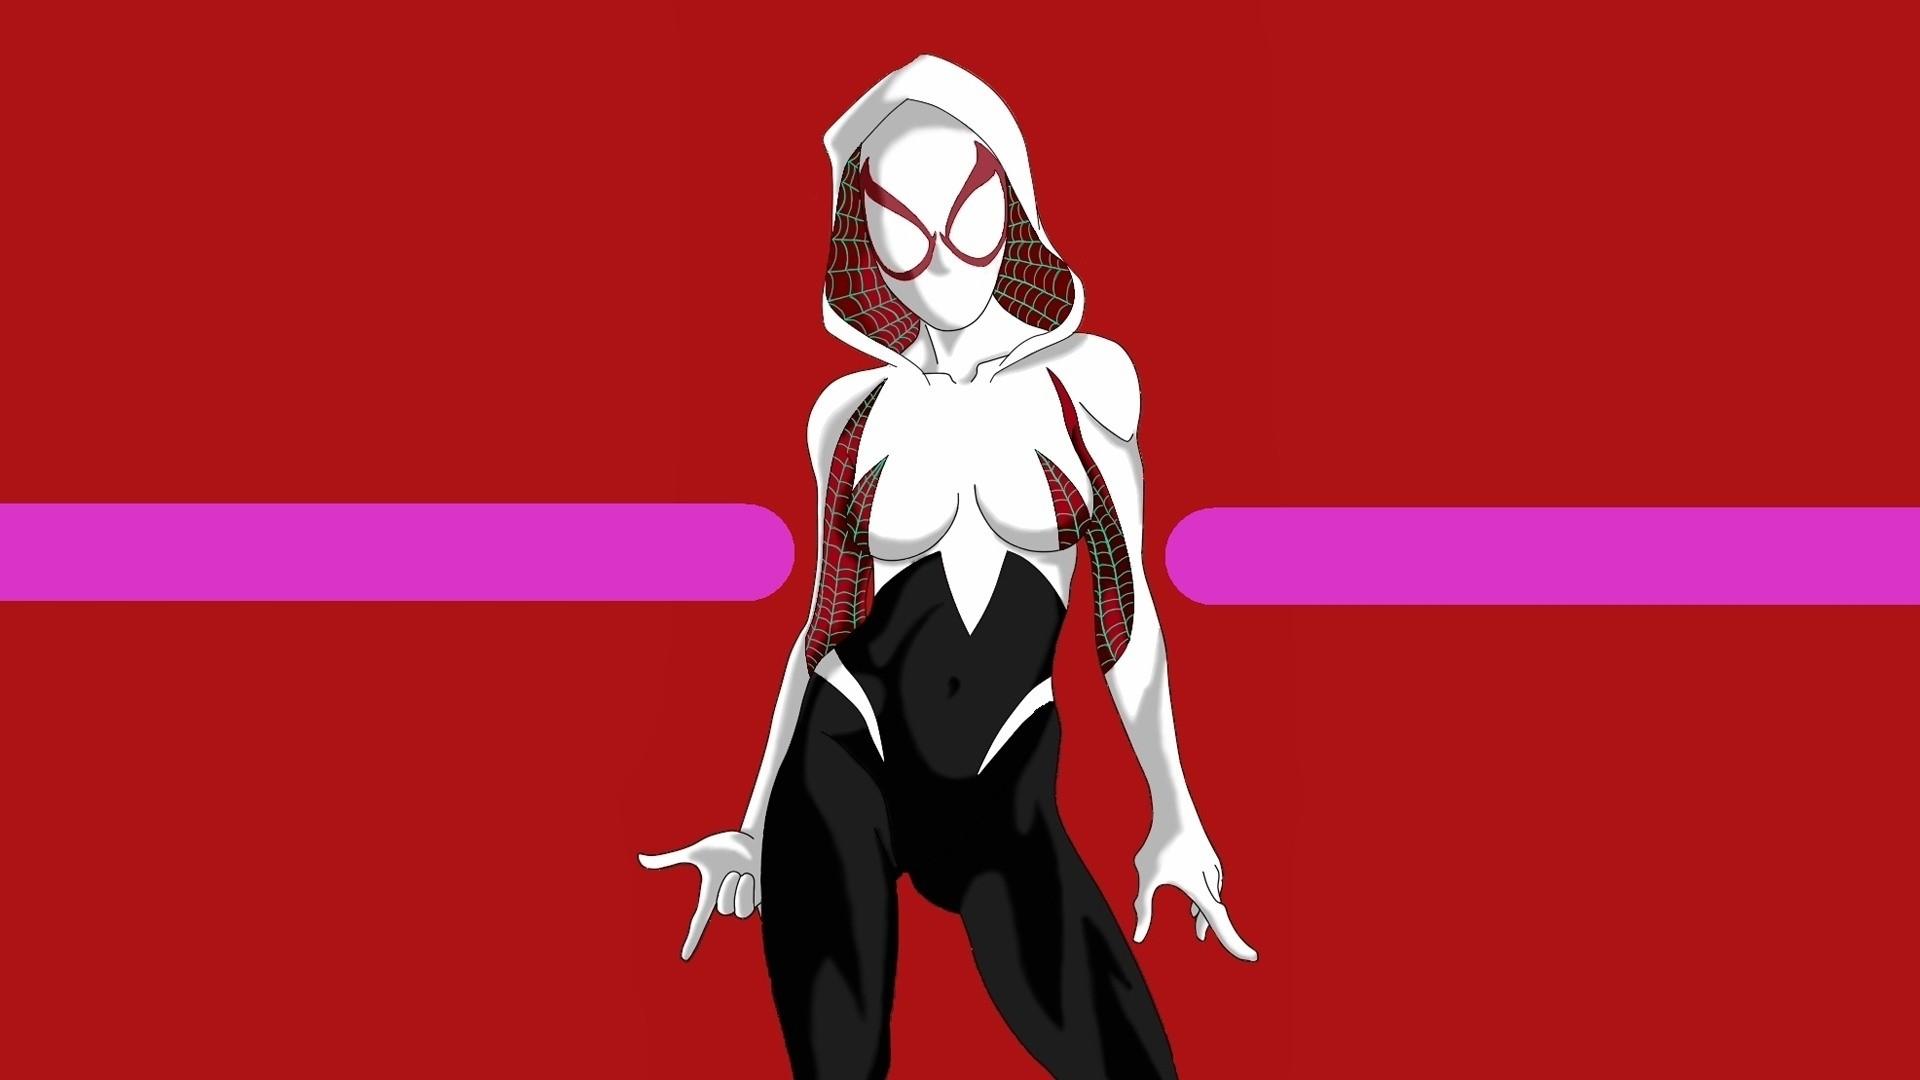 Res: 1920x1080, Title : spider-gwen marvel comics girl wallpaper #7689. Dimension : 1920 x  1080. File Type : JPG/JPEG